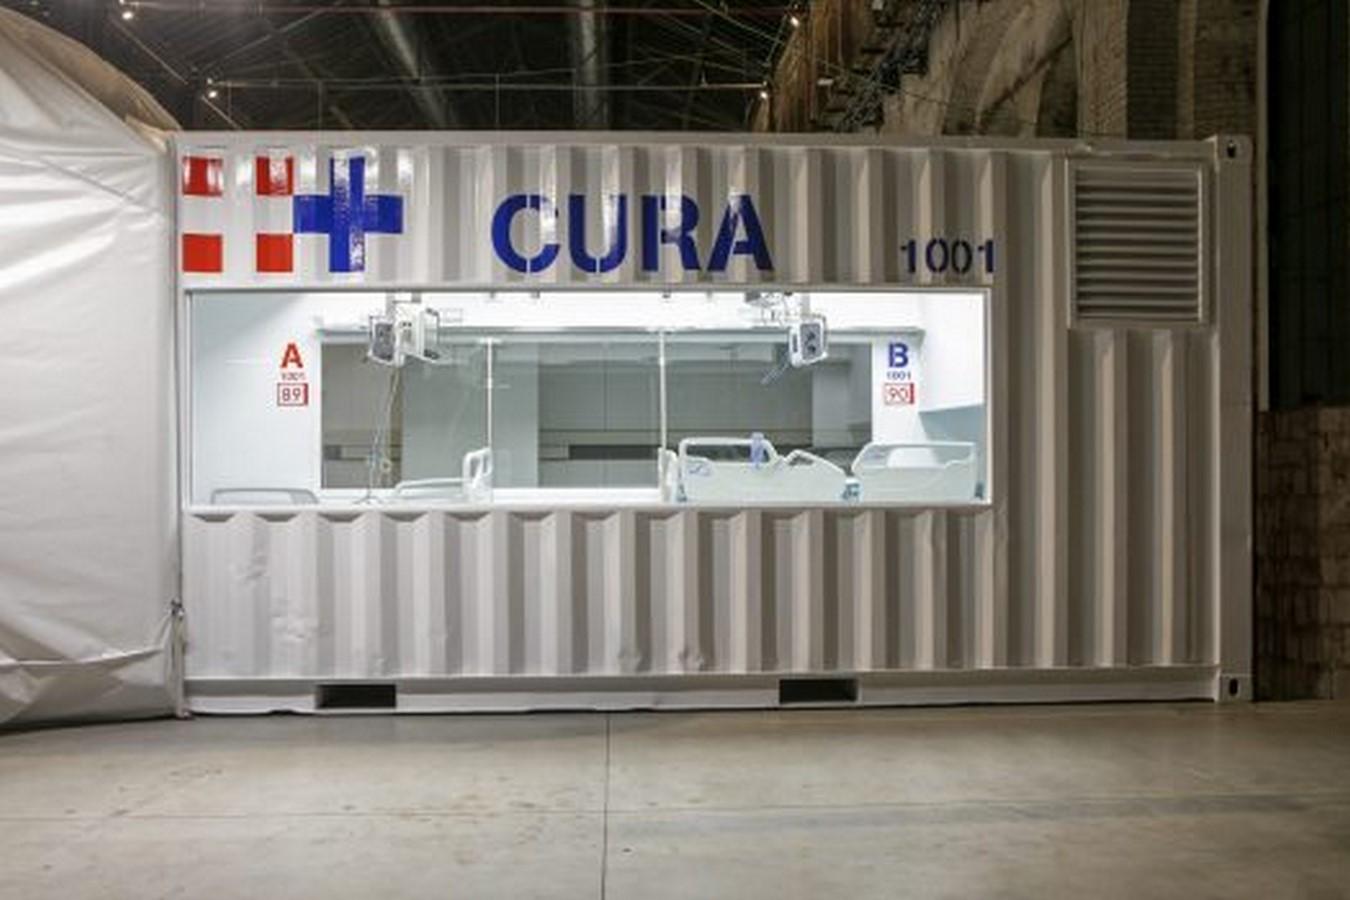 Cura - Sheet3